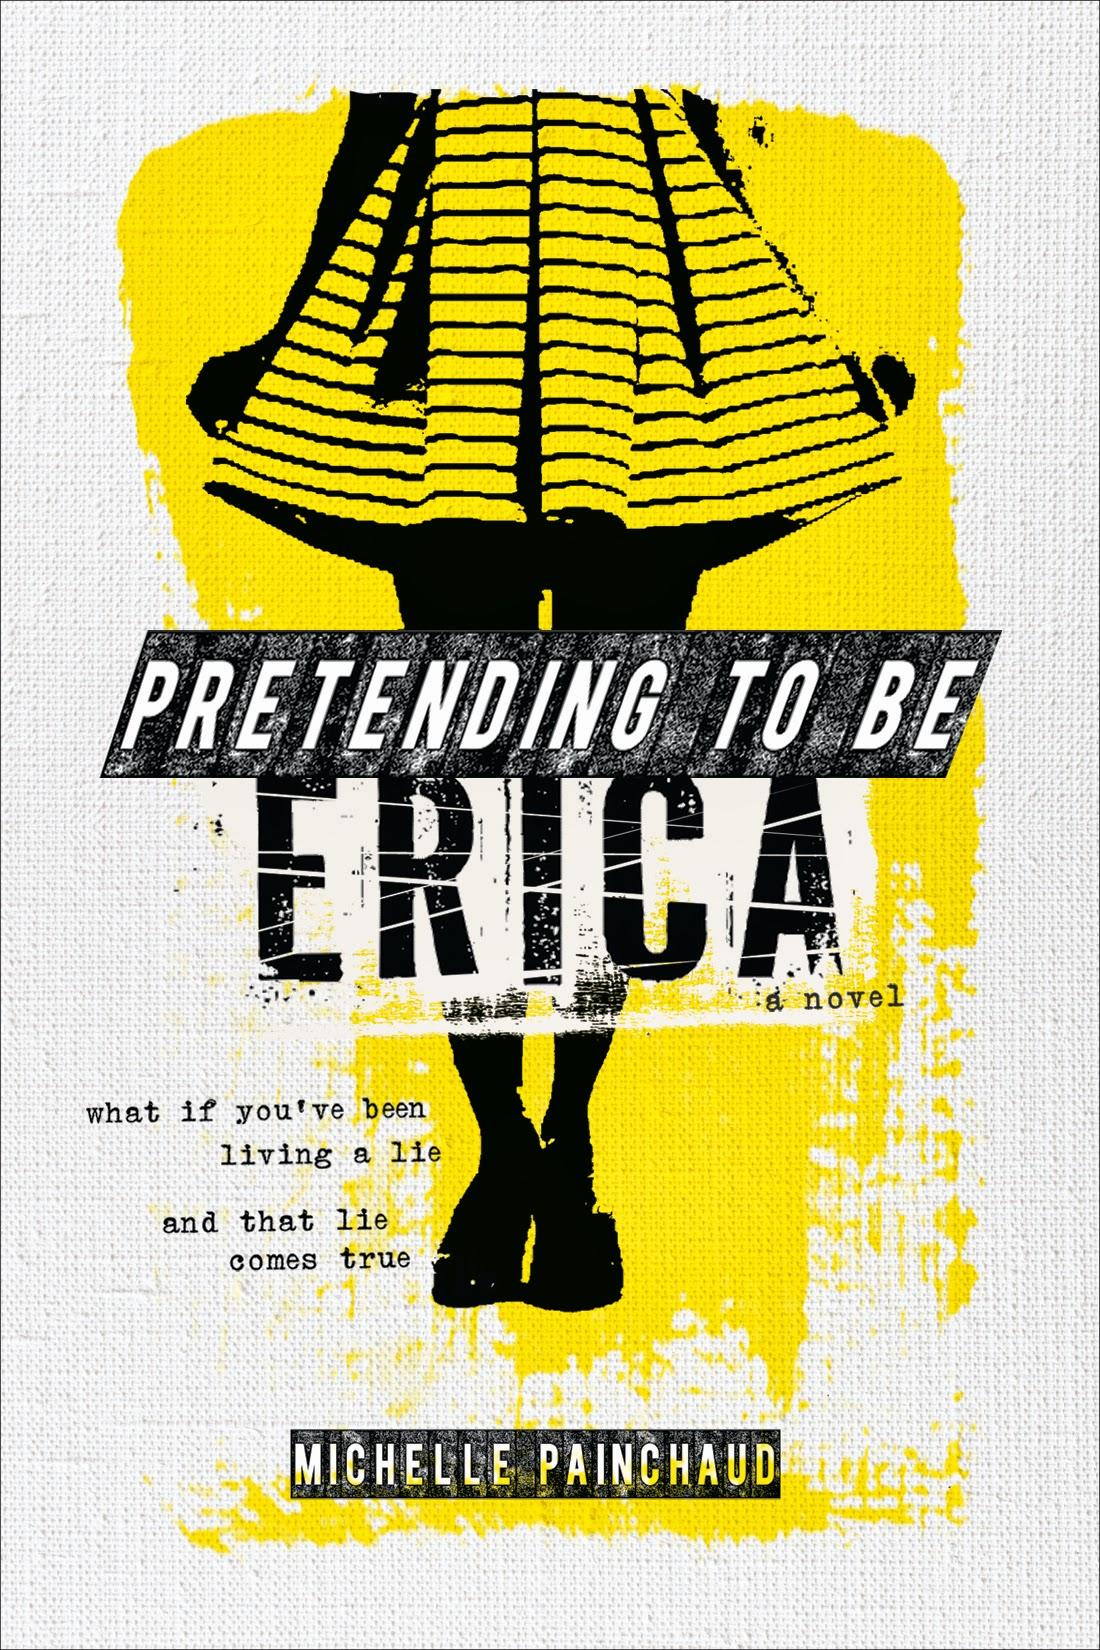 Pretending to be Erica Launch